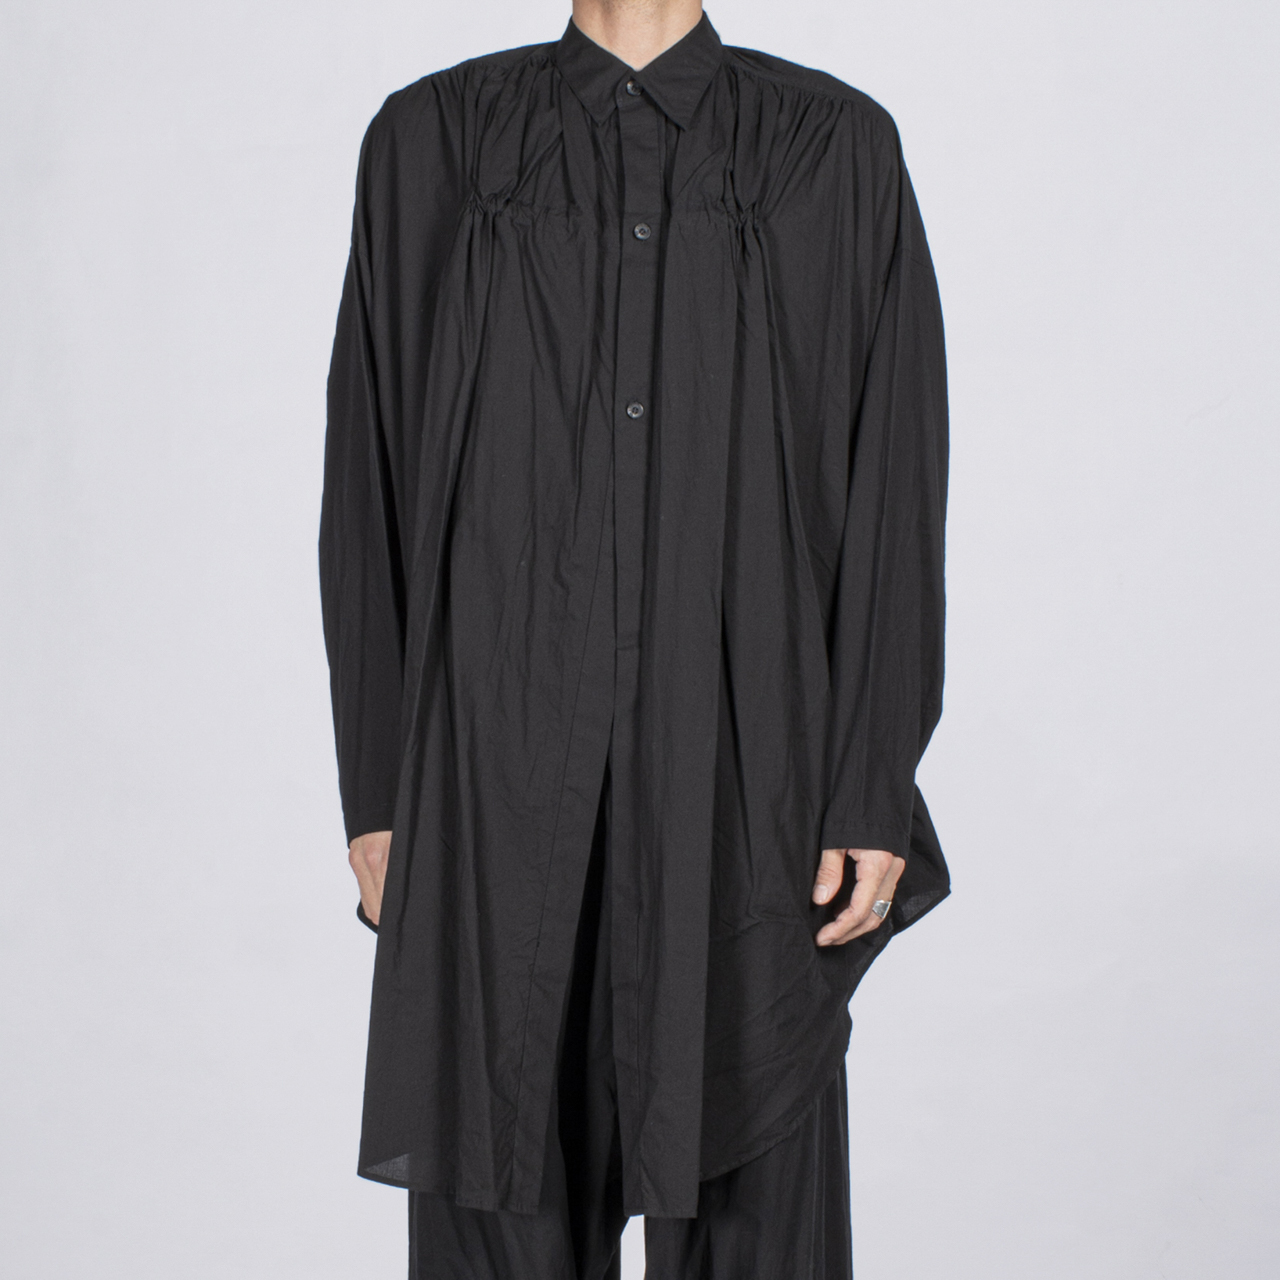 697SHM3-BLACK / フロントギャザーロングシャツ